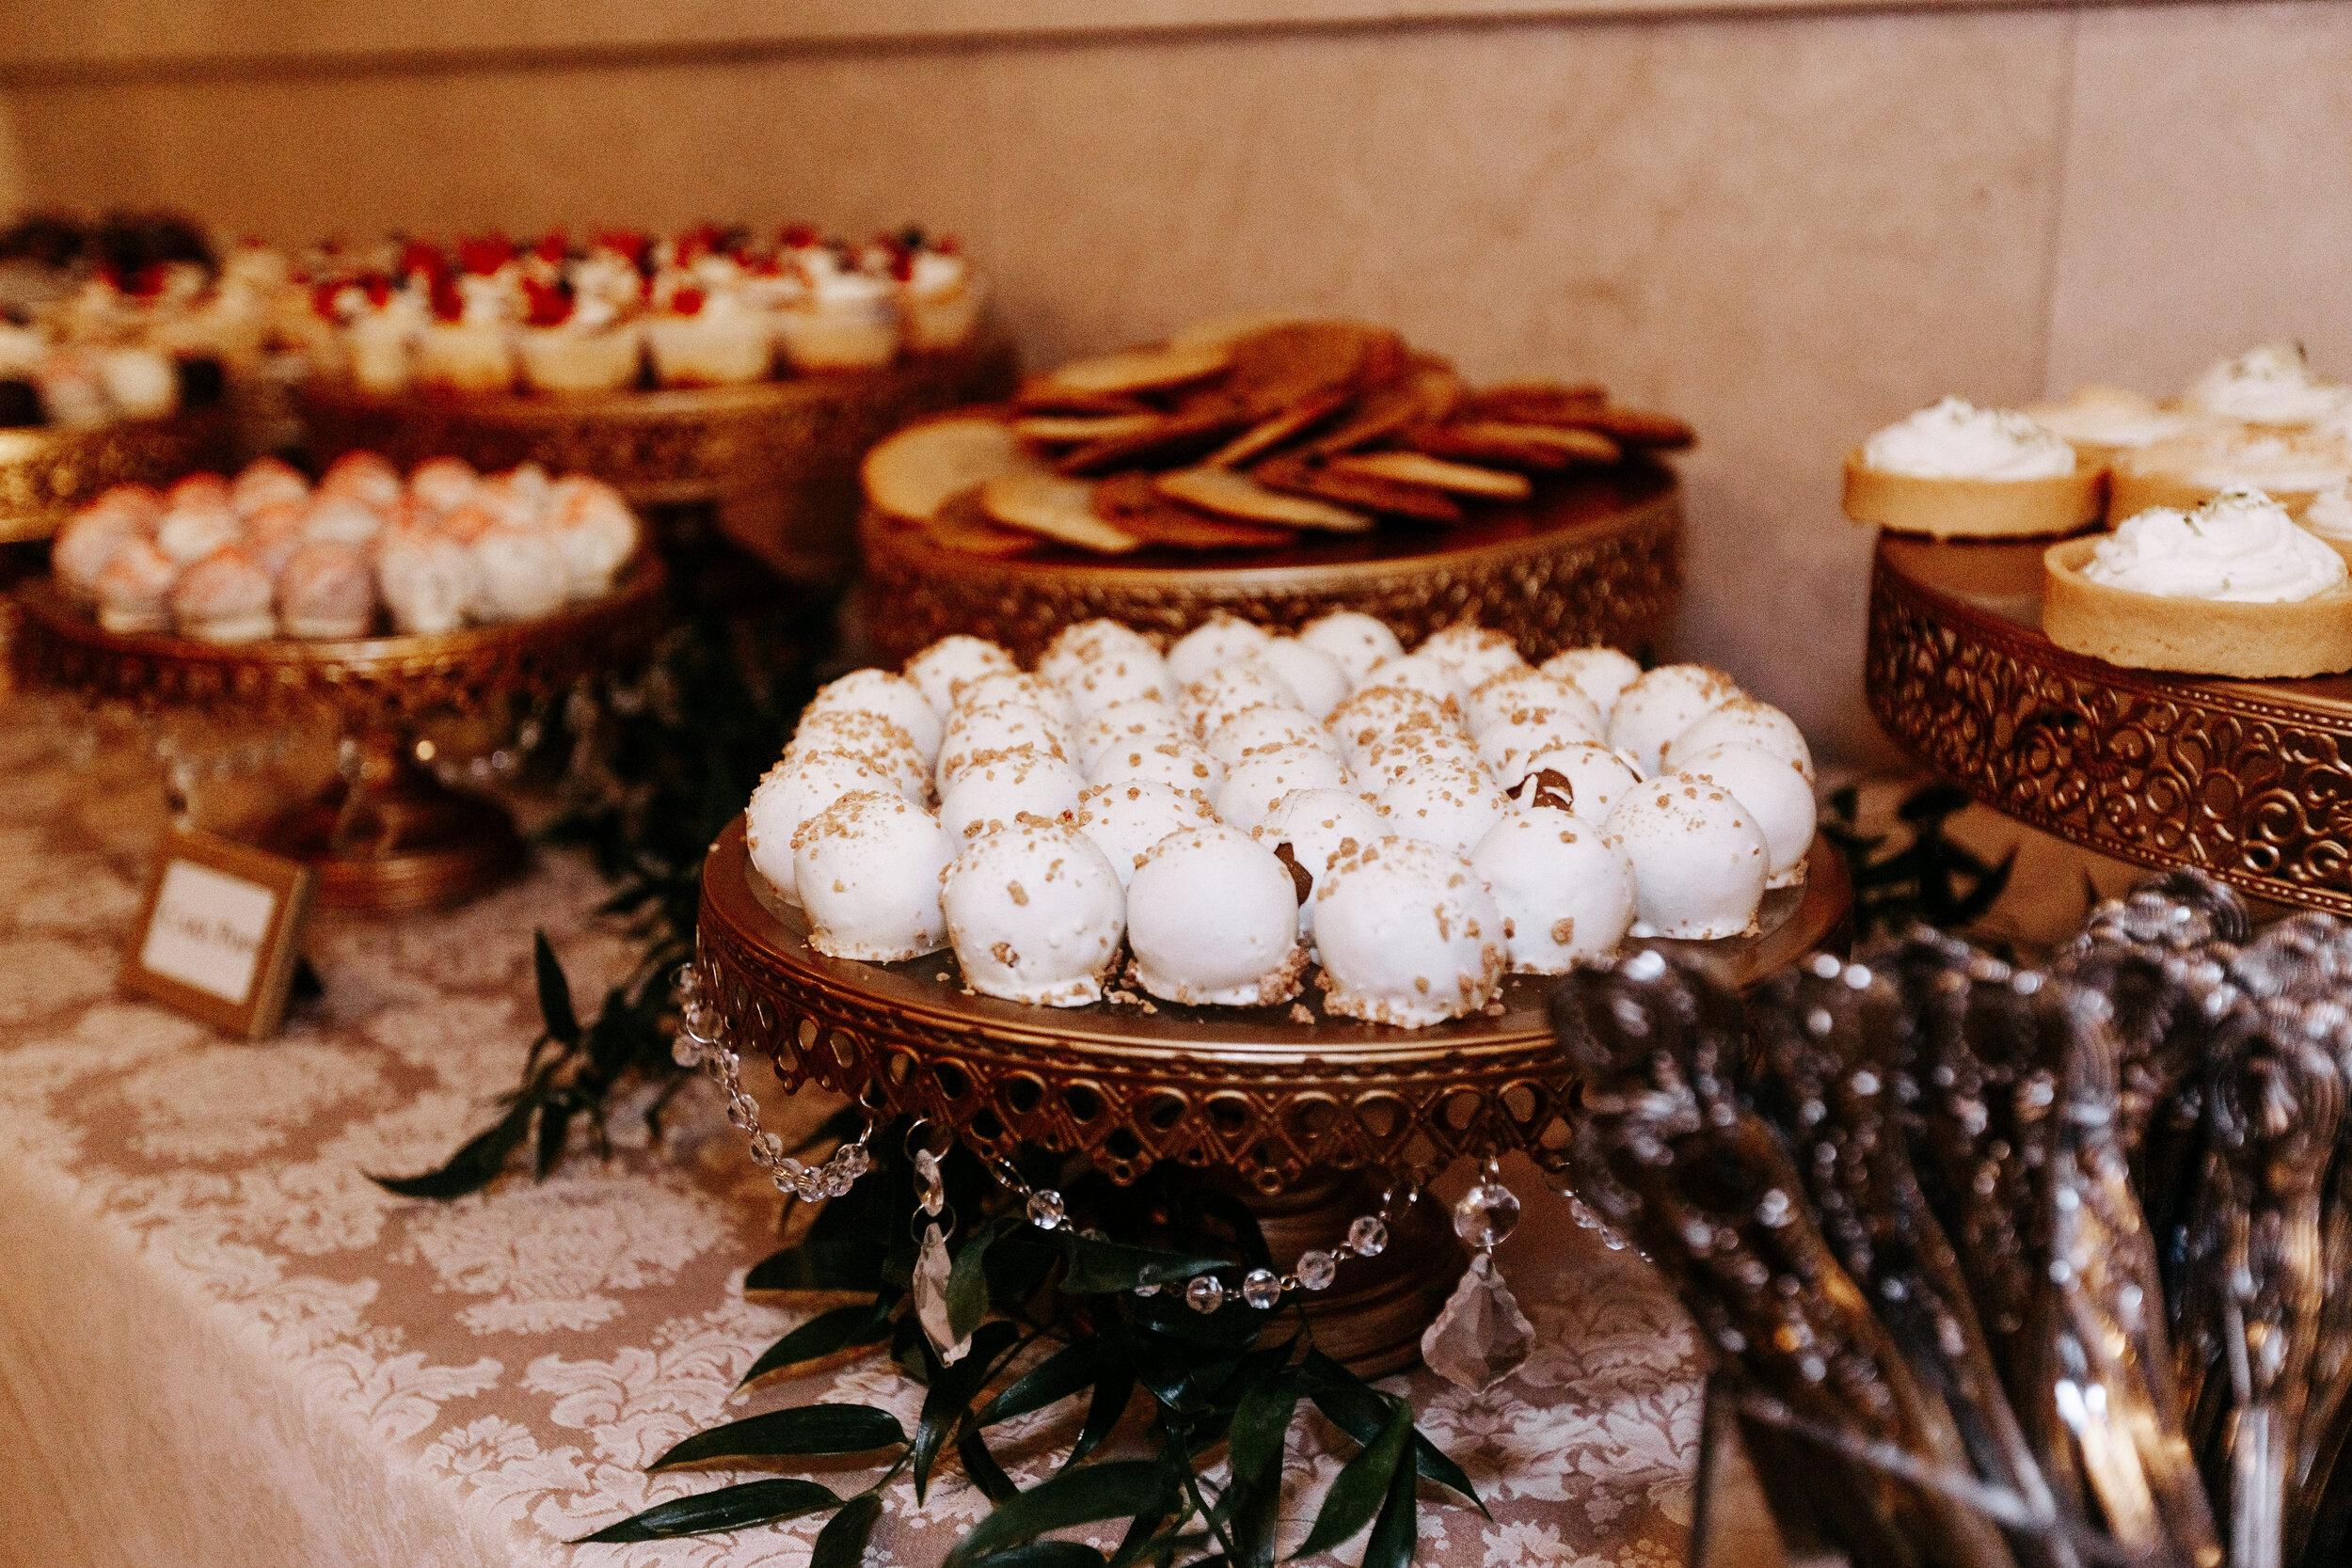 Cassie-Mrunal-Wedding-Quirk-Hotel-John-Marshall-Ballrooms-Richmond-Virginia-Photography-by-V-120.jpg